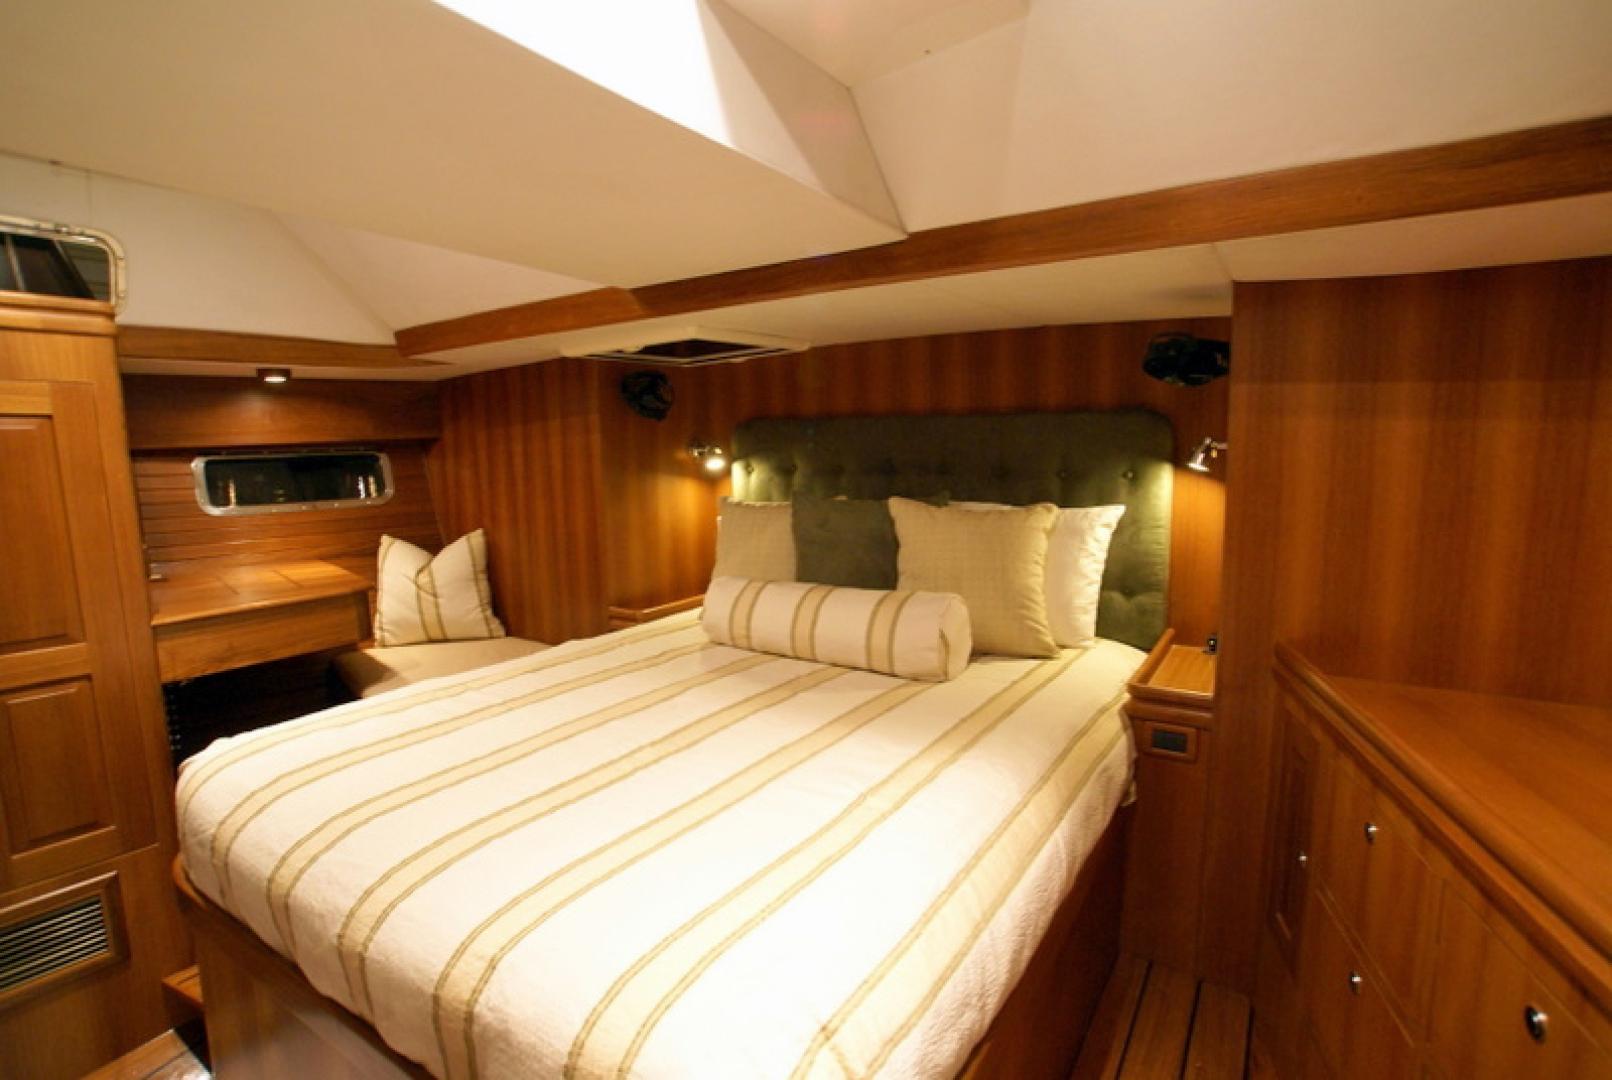 Hylas-70 Centerboard Cruiser 2007-AMANTE Barcelona-Spain-Owners SR-1555654   Thumbnail